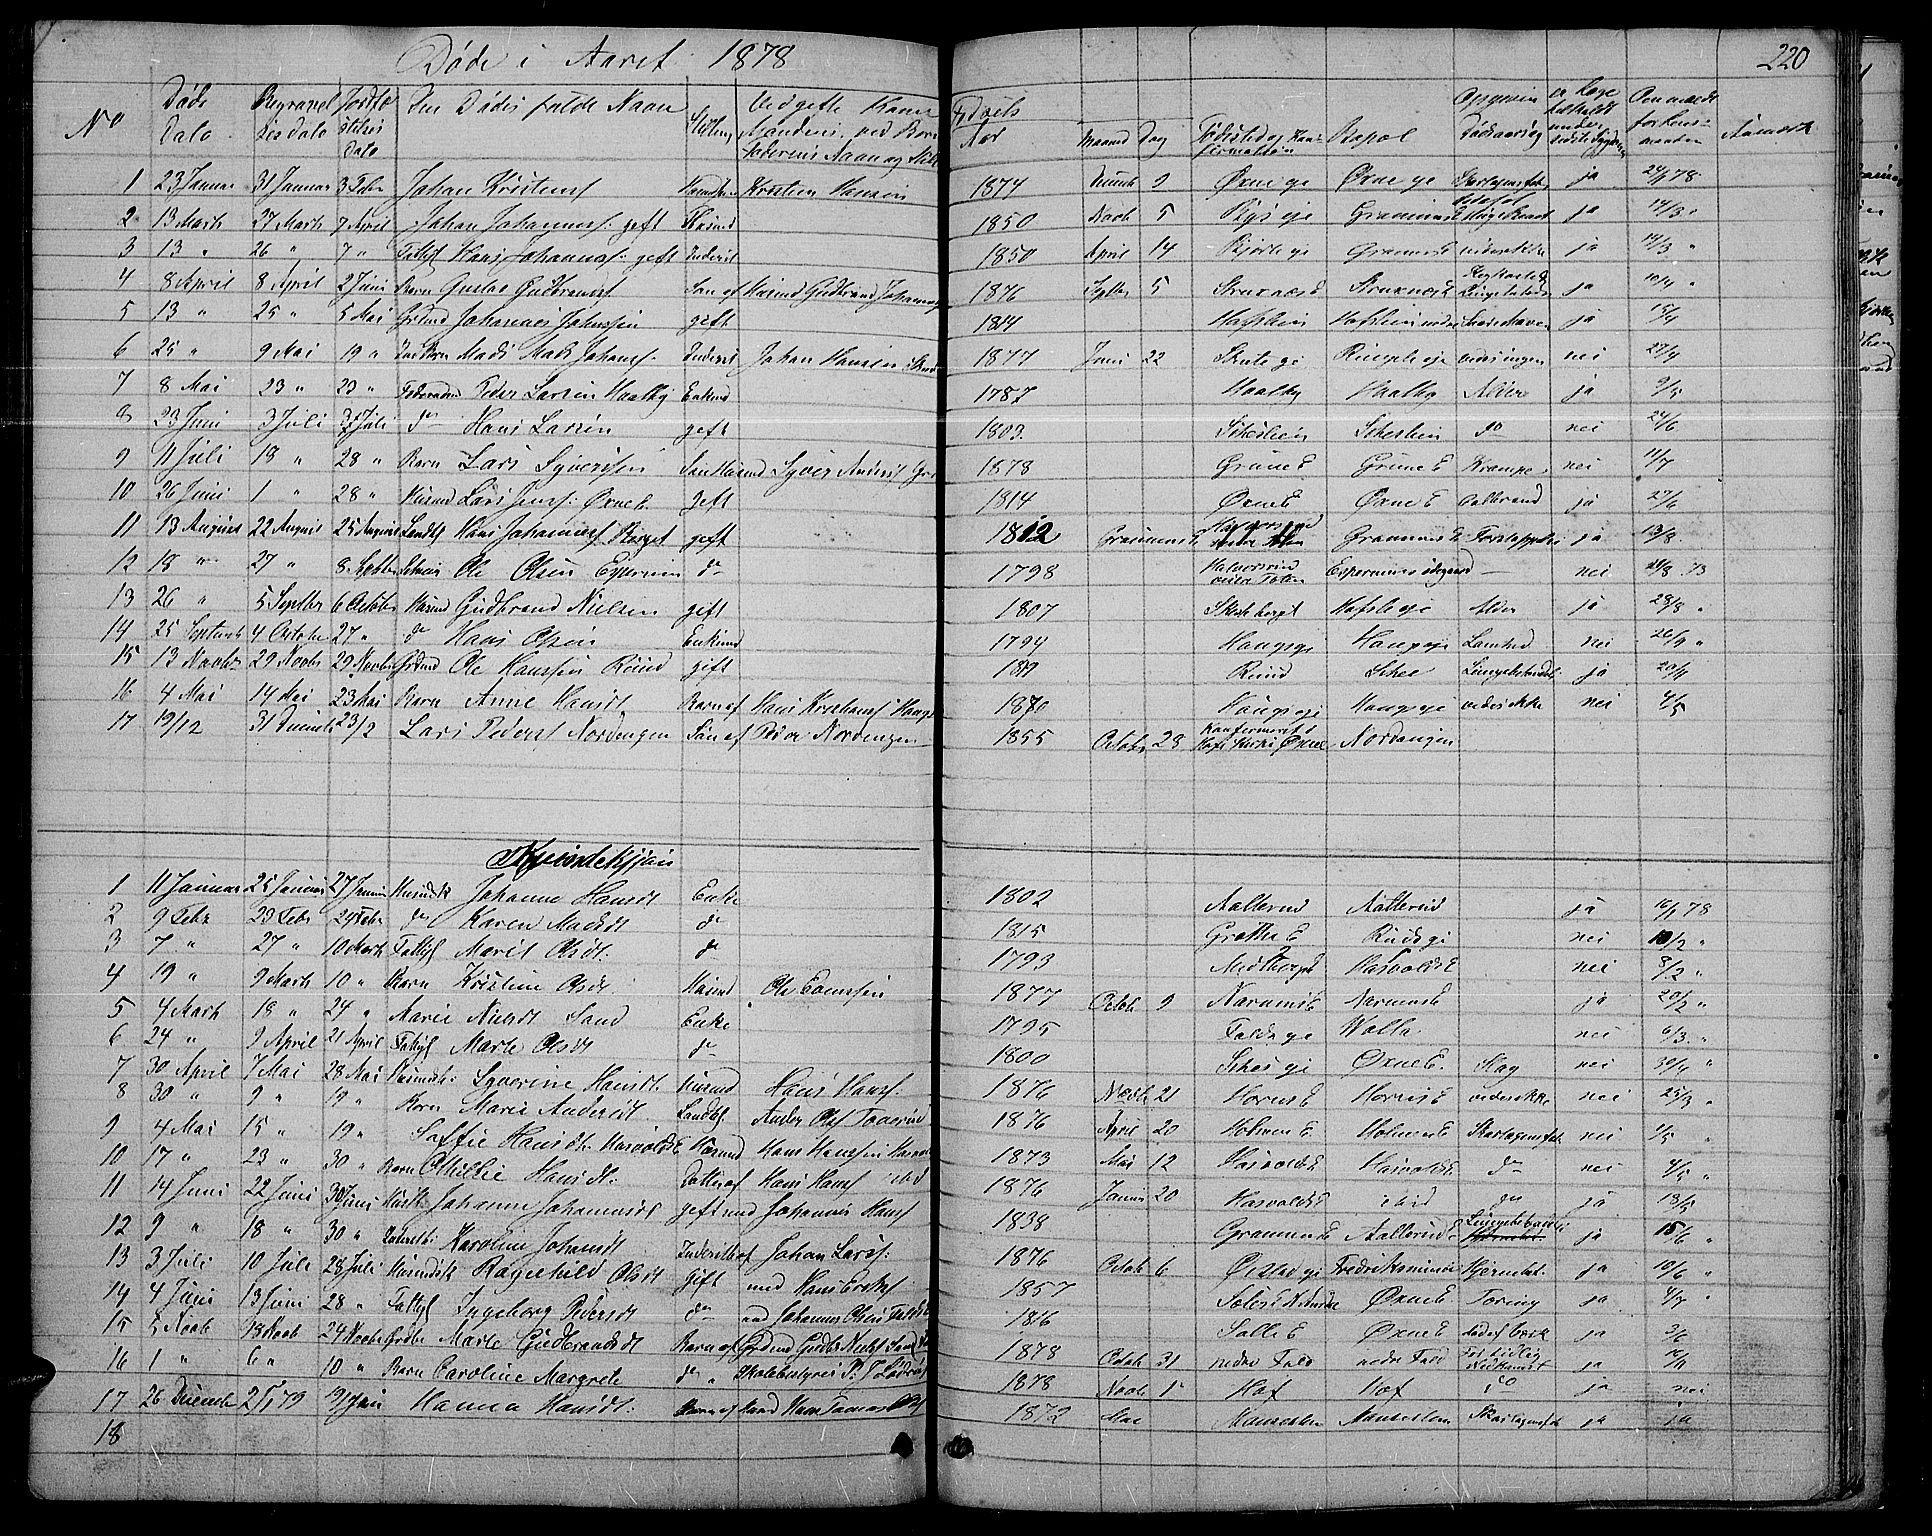 SAH, Søndre Land prestekontor, L/L0001: Klokkerbok nr. 1, 1849-1883, s. 220